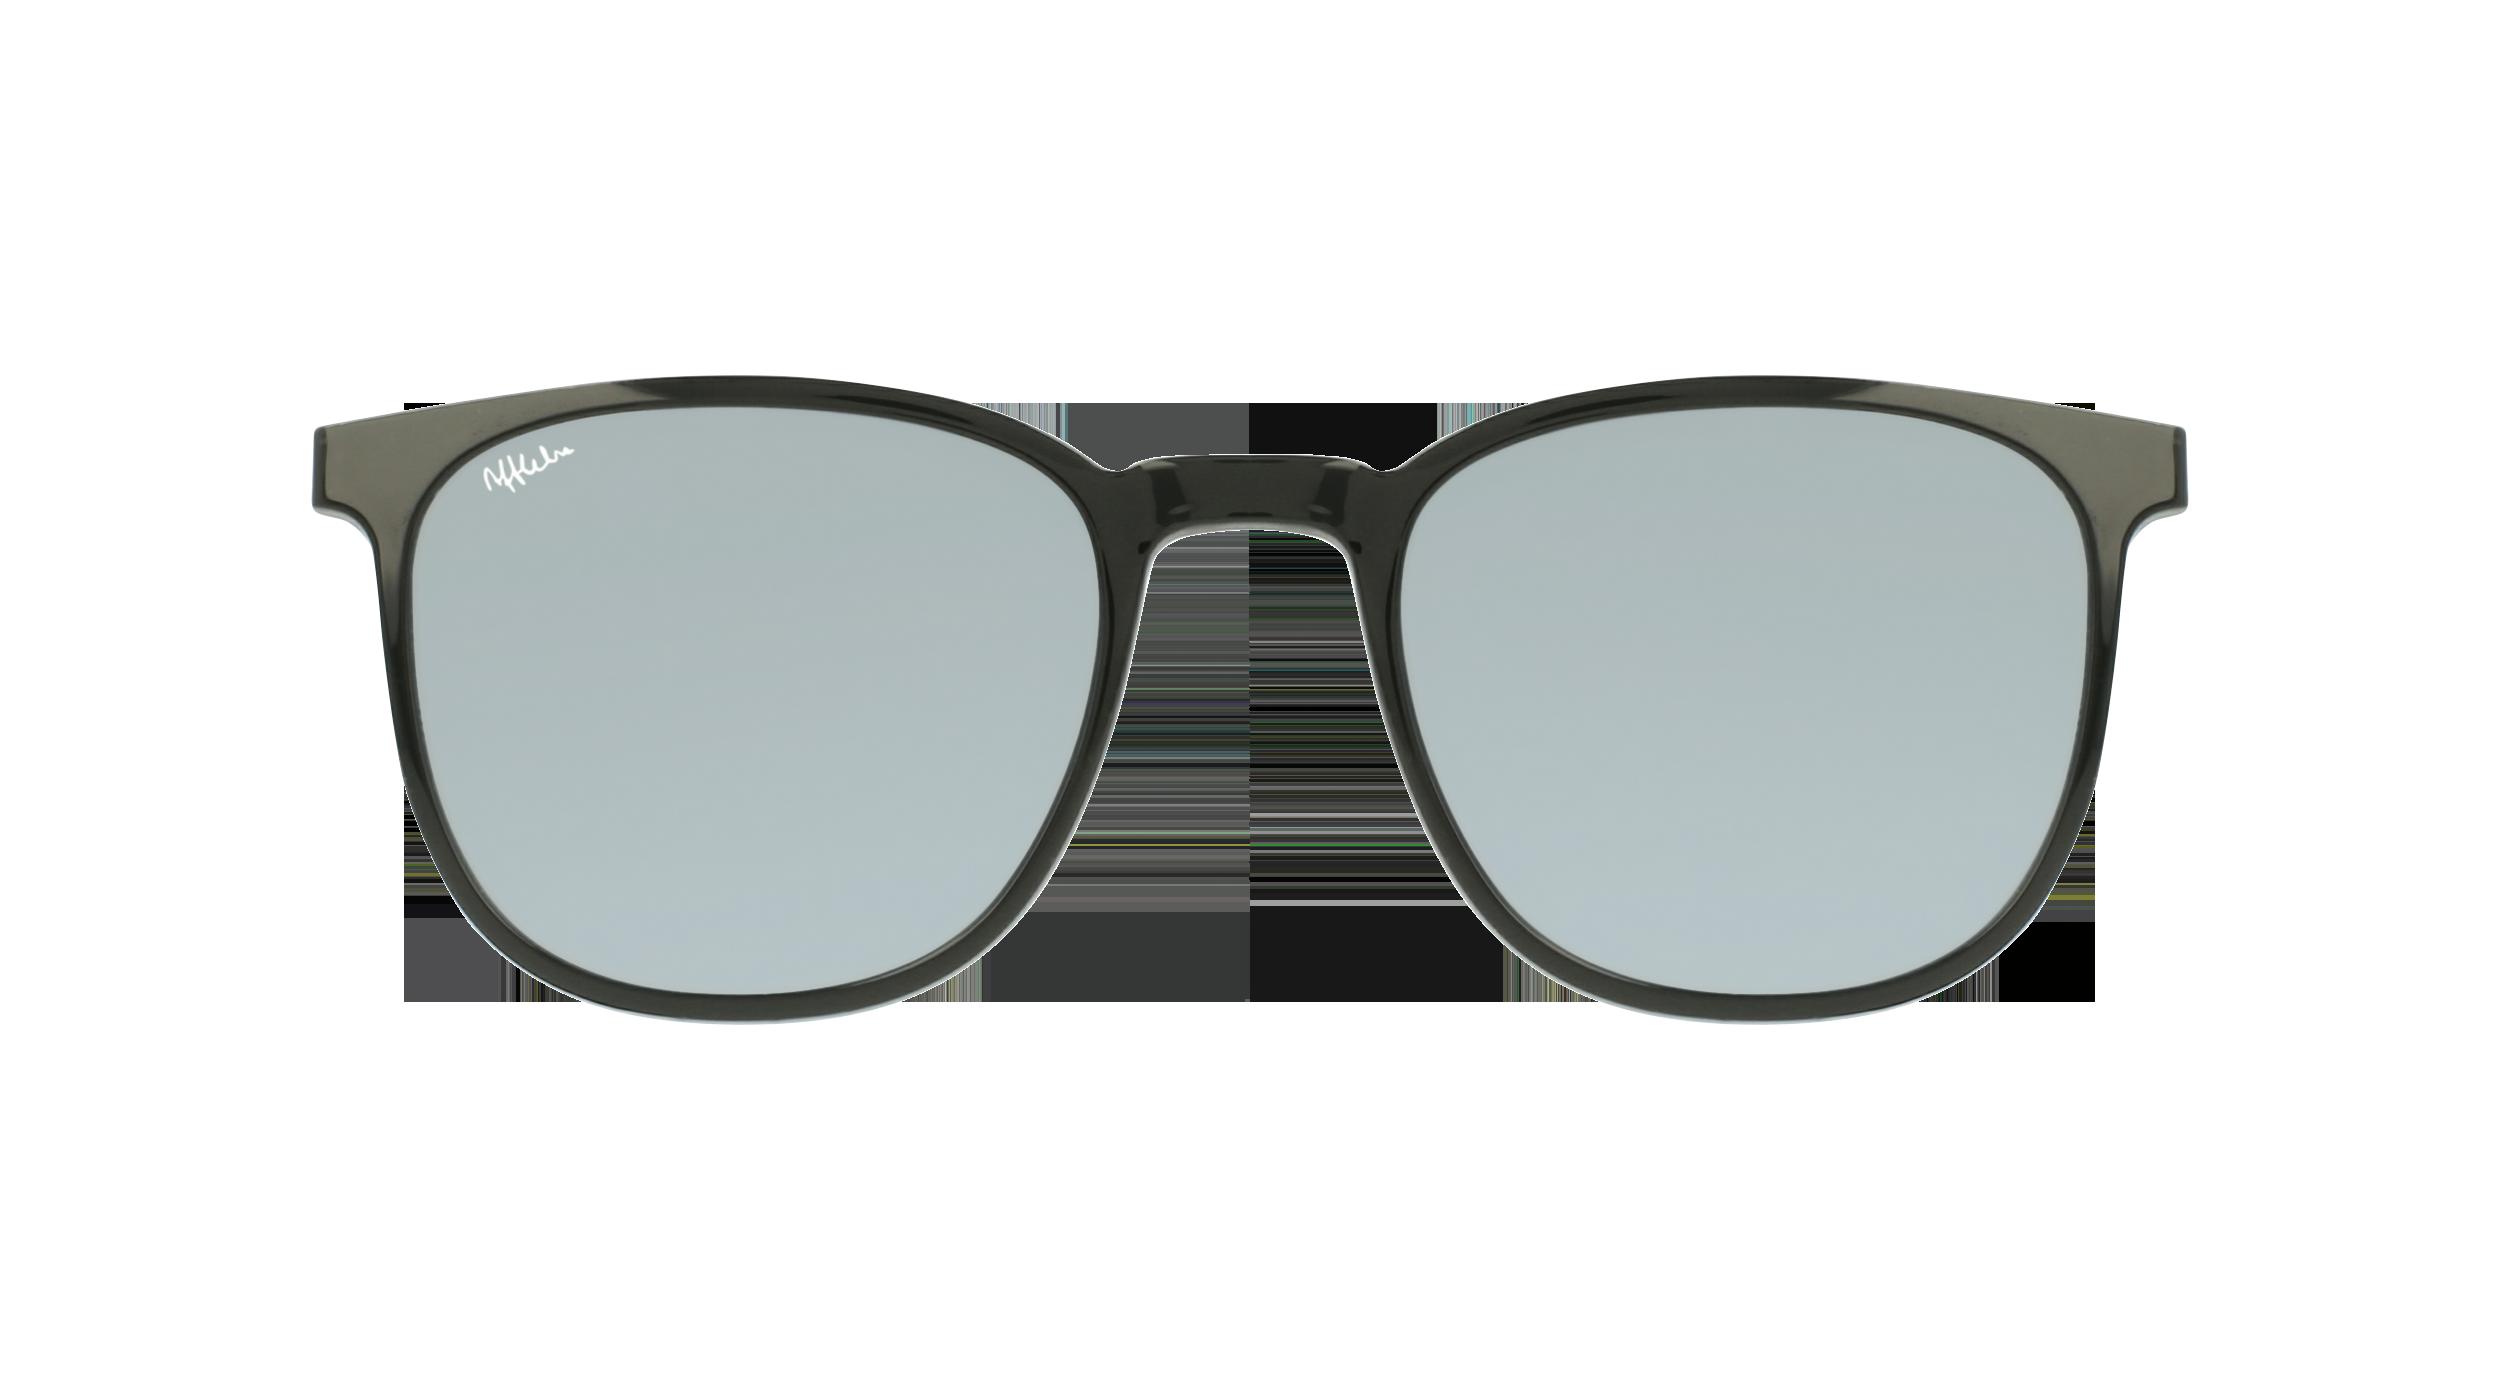 afflelou/france/products/smart_clip/clips_glasses/07630036457337.png